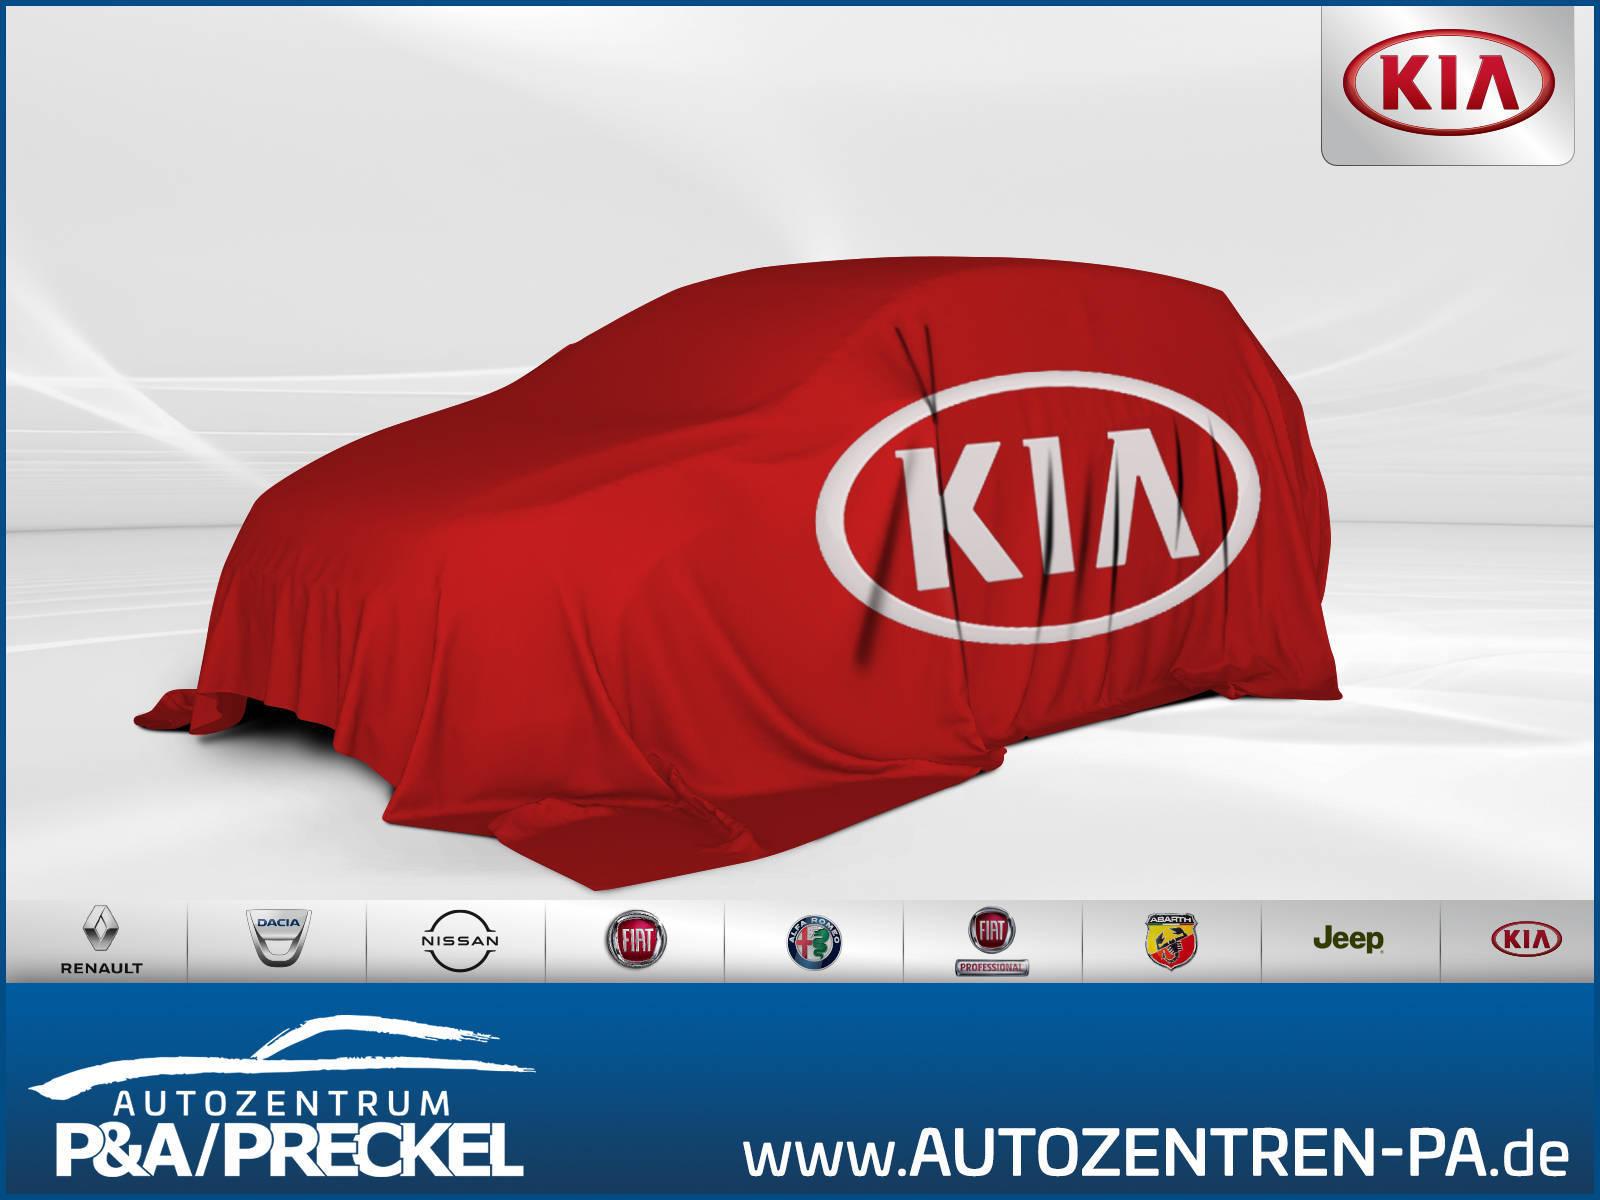 Kia XCeed EDITION 7 1.0 T-GDI OPF / Emotion-Paket, Jahr 2020, Benzin